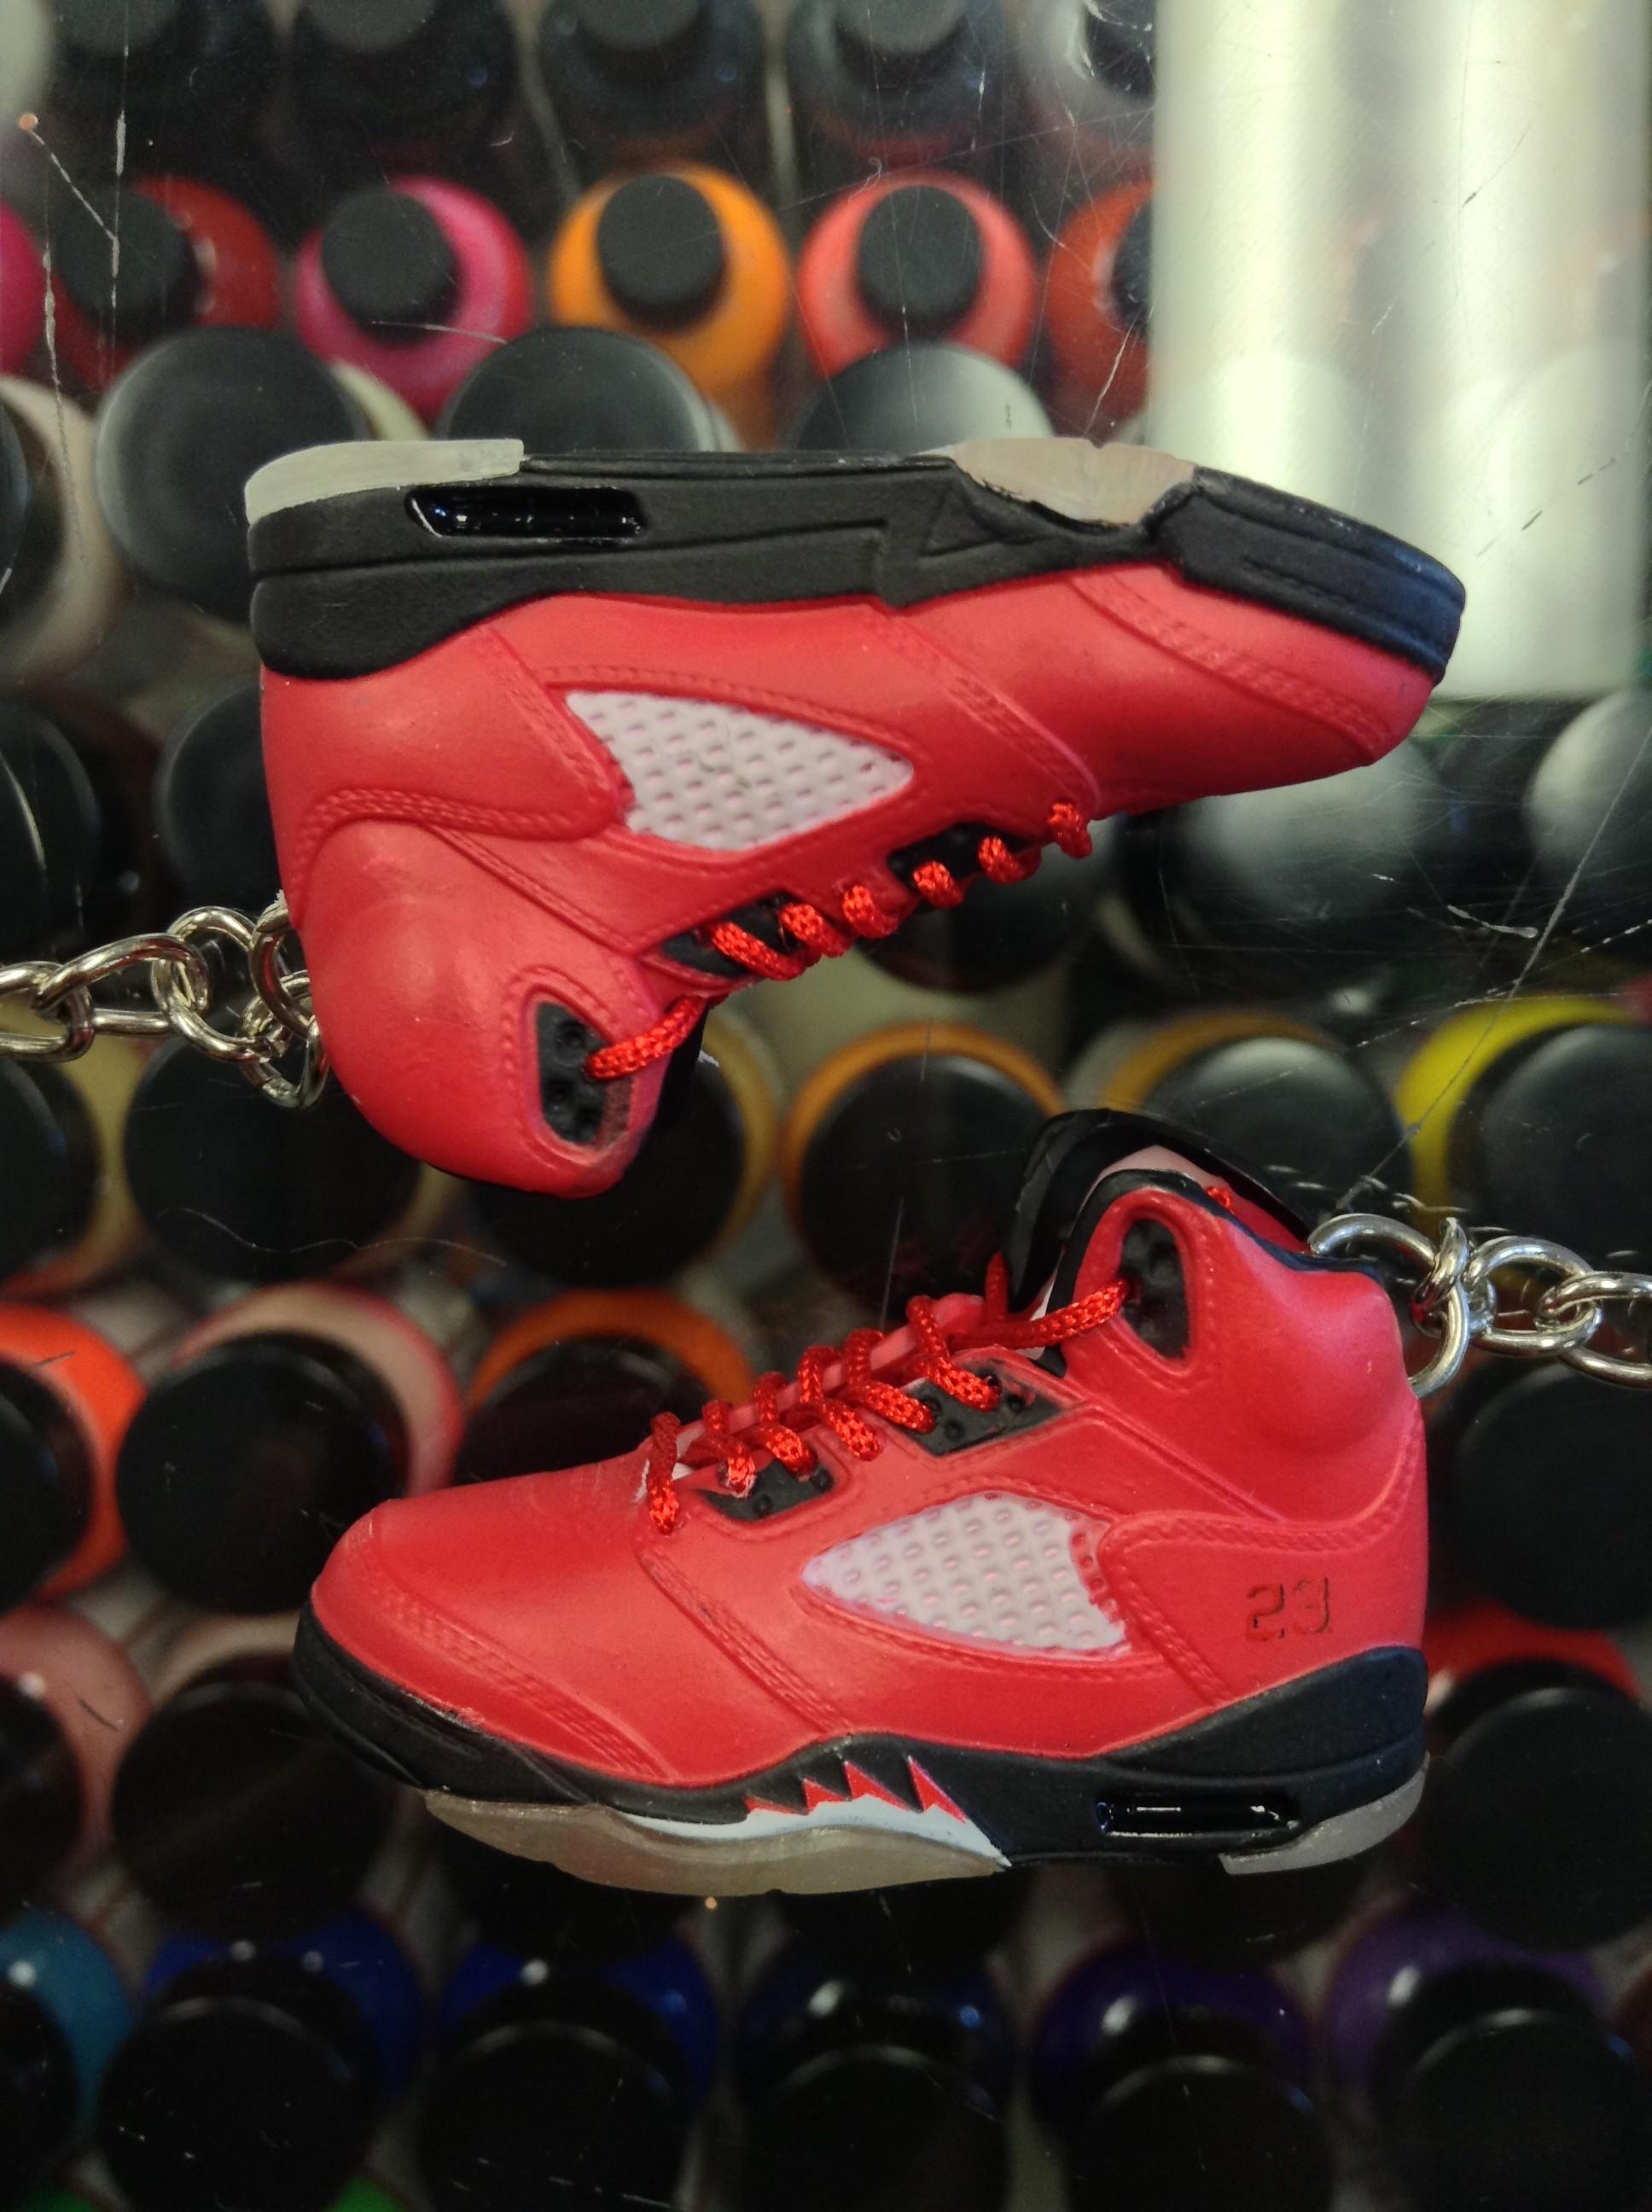 e4a2c352a7b21 2009 Nike Air Jordan V Raging Bull Red Suede 3D Keychain